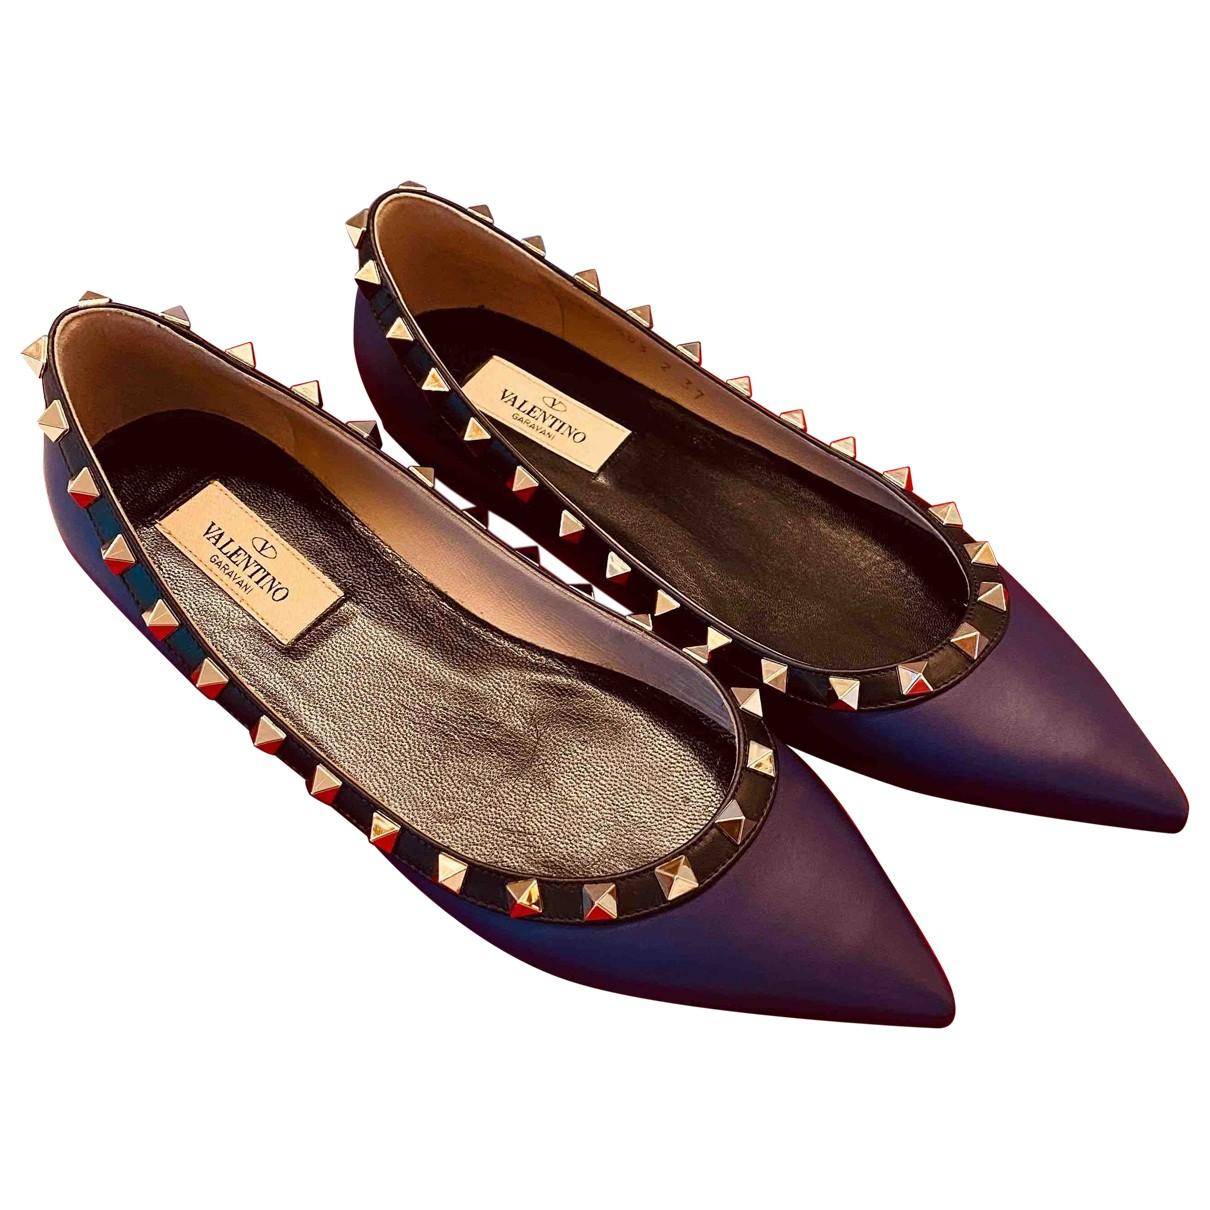 Valentino Garavani Rockstud Purple Leather Flats for Women 37 EU